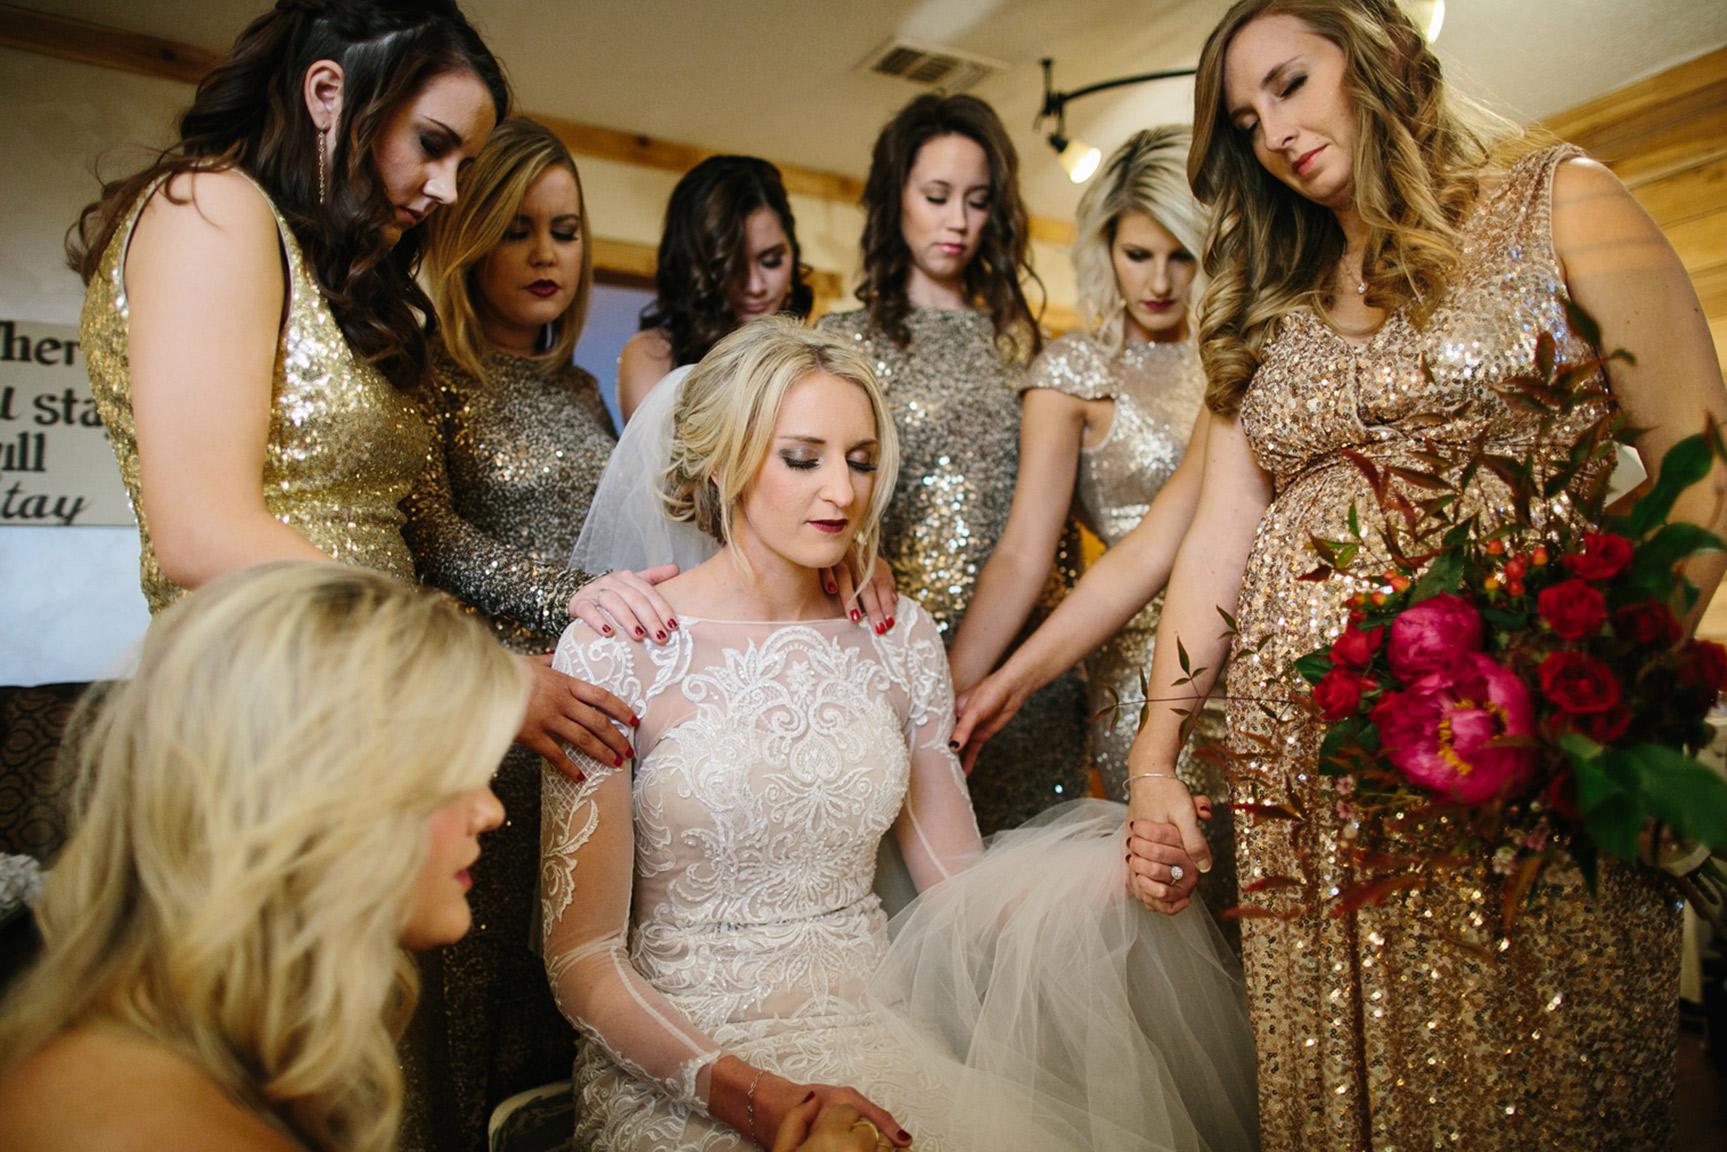 Cotton_Creek_Barn_Winter_Wedding_WeddingPhotographer040.jpg